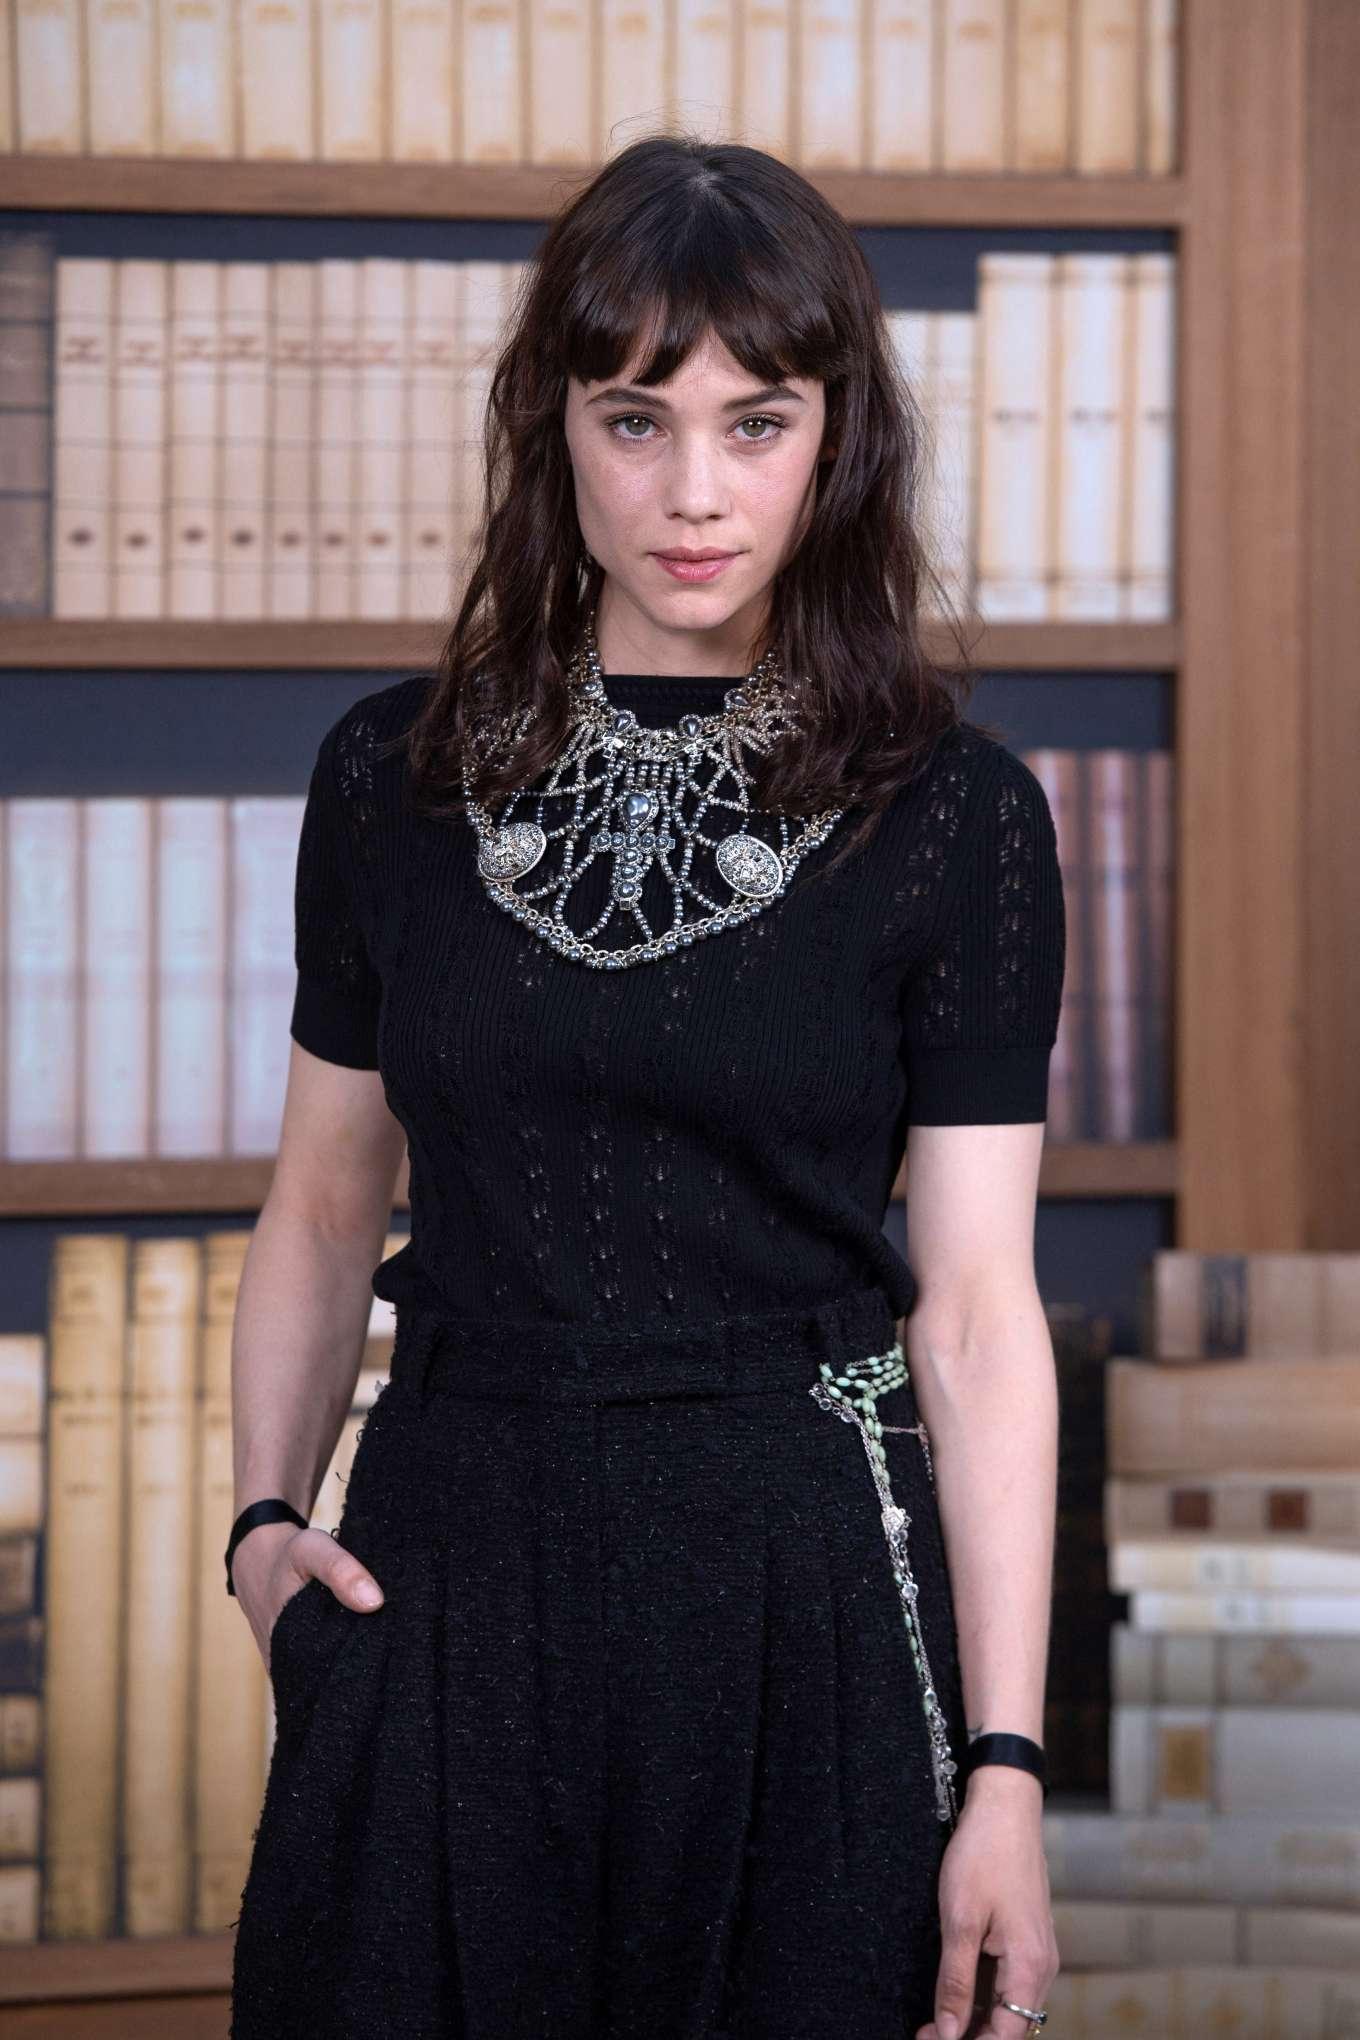 Astrid Berges-Frisbey - 2019 Paris Fashion Week - Chanel Haute Couture FW 19-20